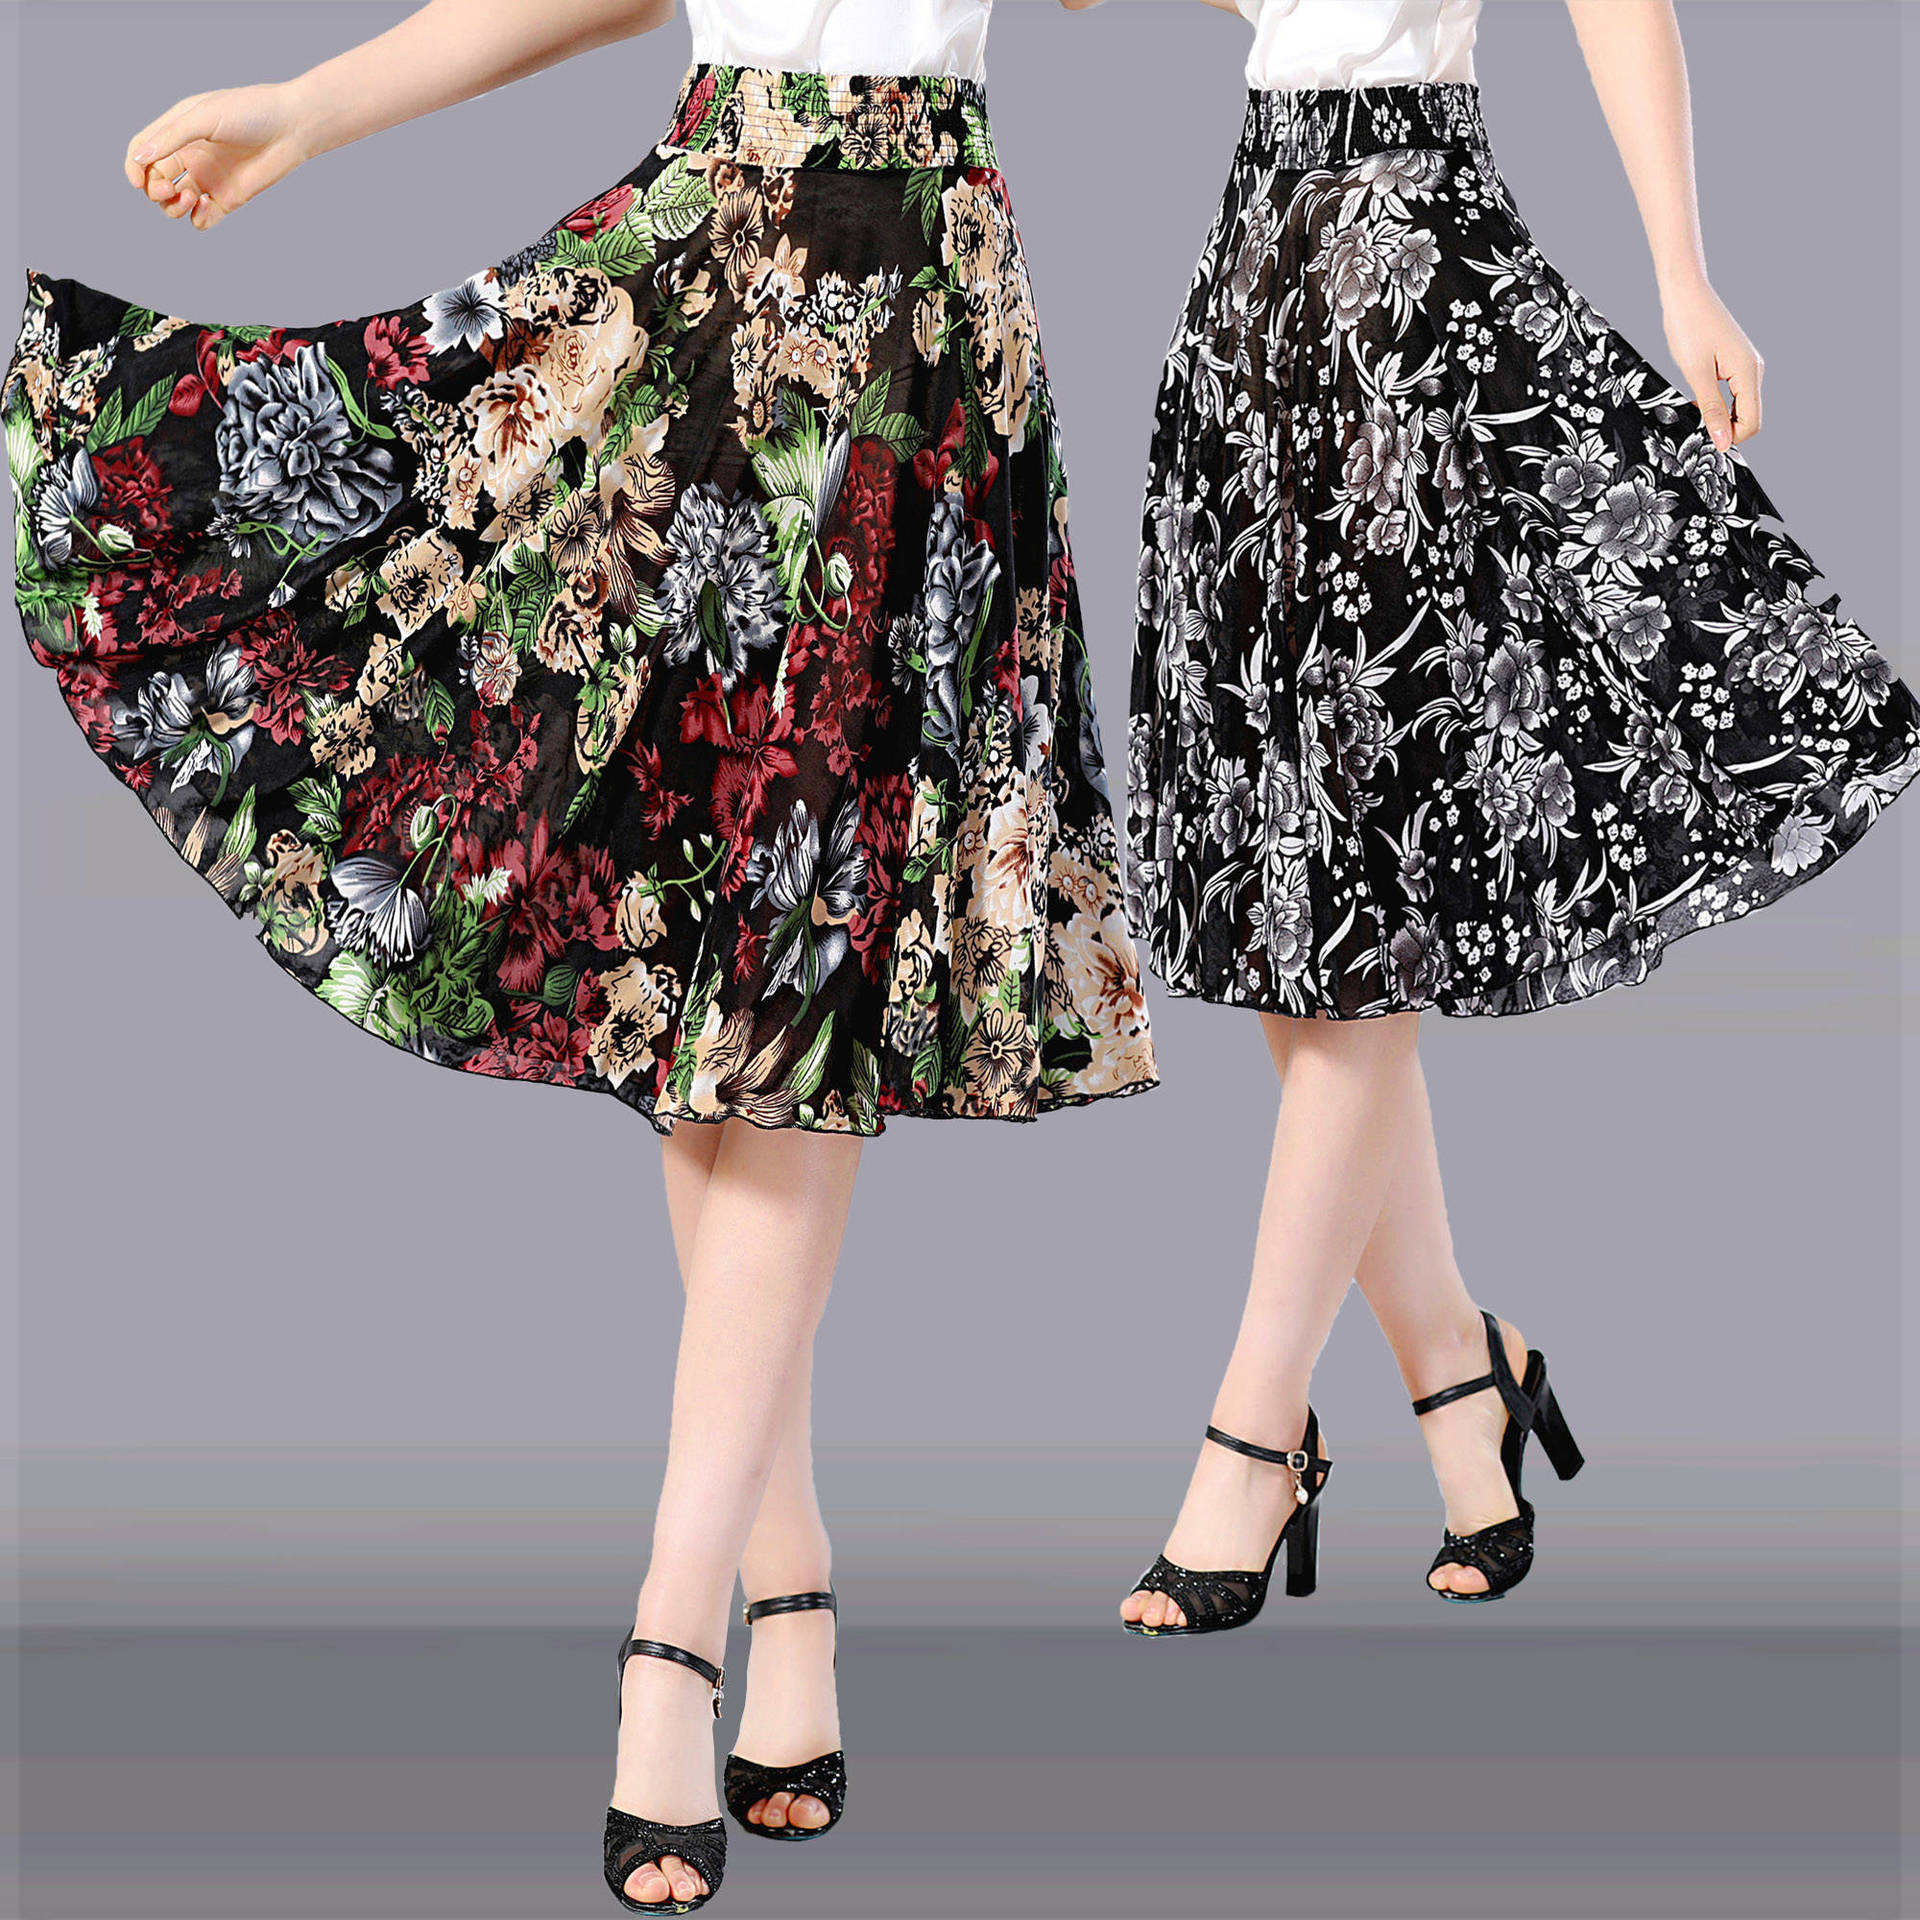 Middle-aged WOMEN'S Apparels Summer Short Skirt Middle-aged Women Dress Elastic High Waist Square Dance Clothing Skirt Large Siz